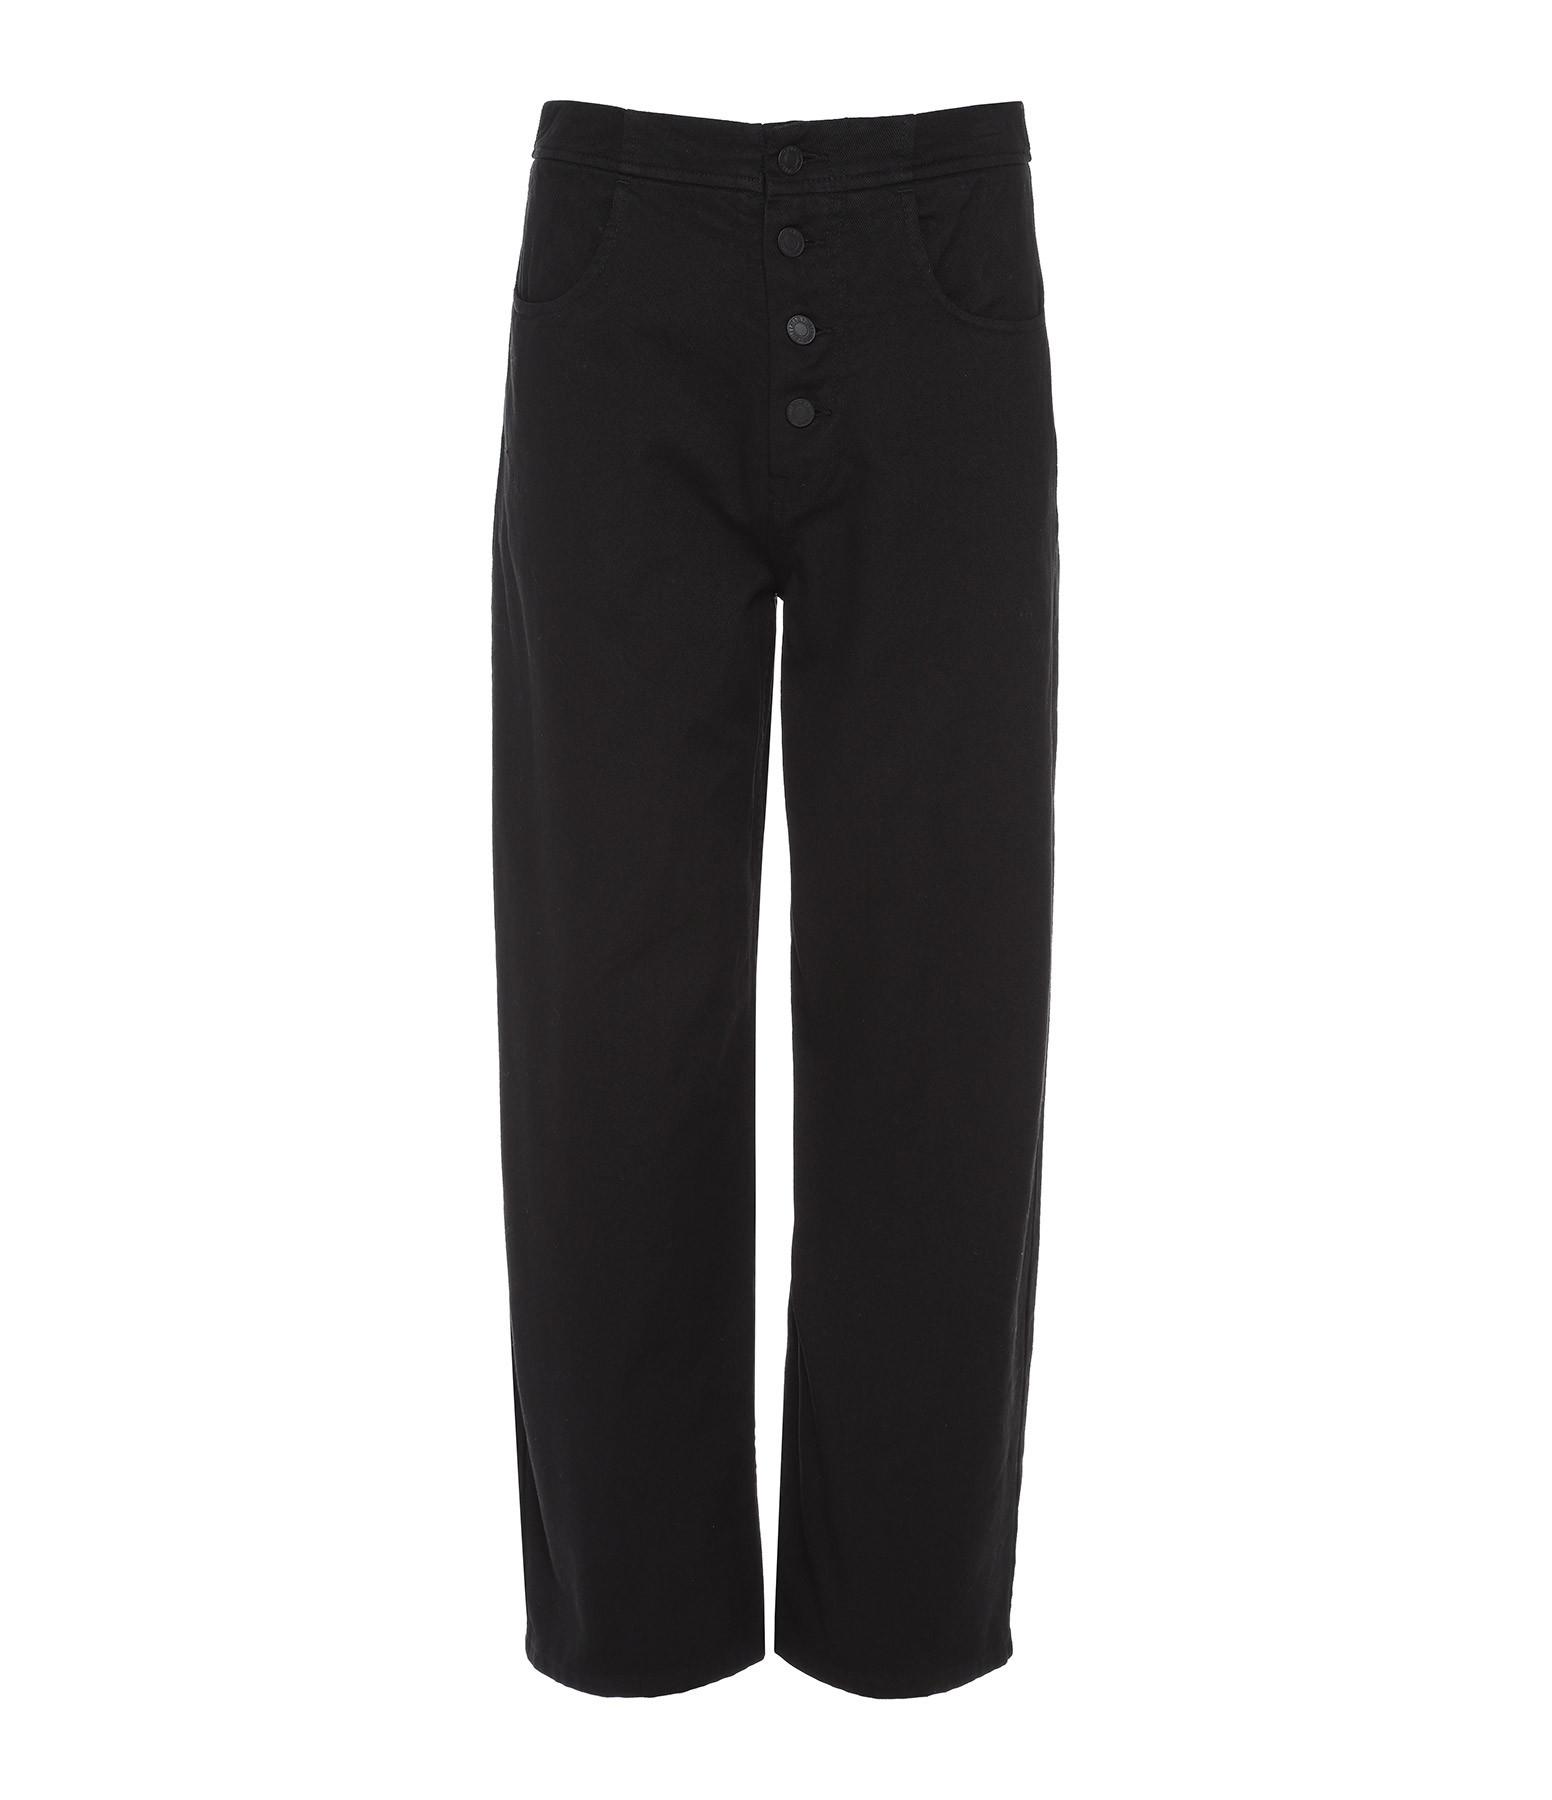 NILI LOTAN - Pantalon Toledo Noir